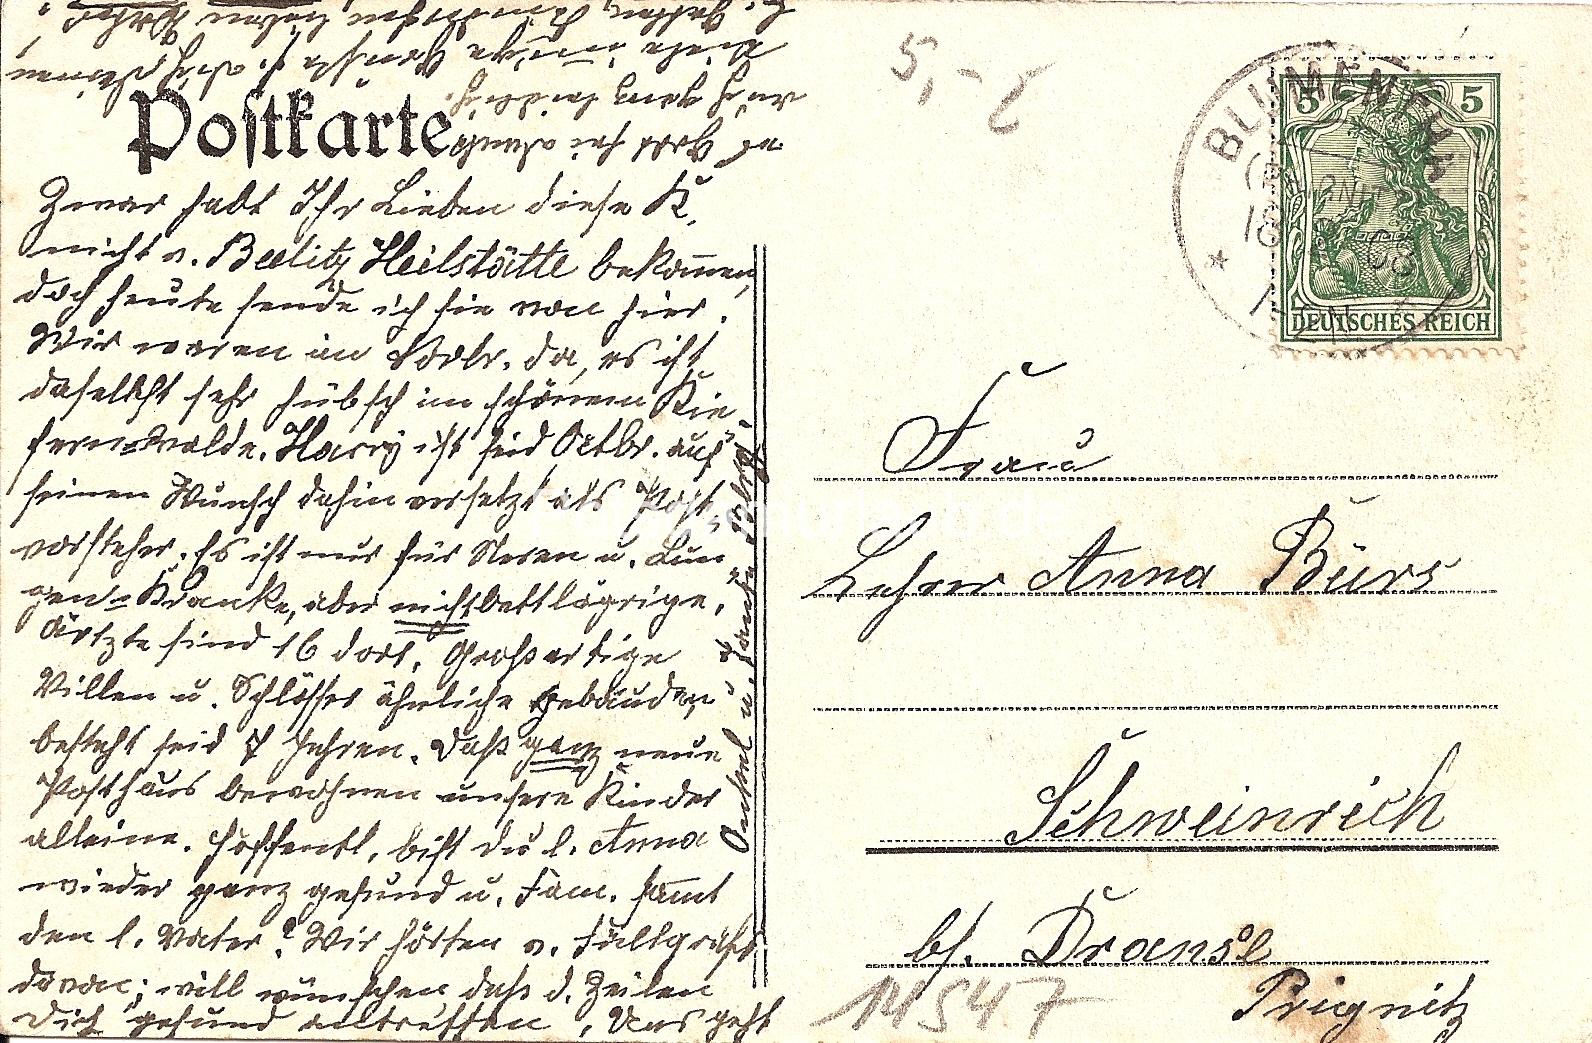 1908 02 17